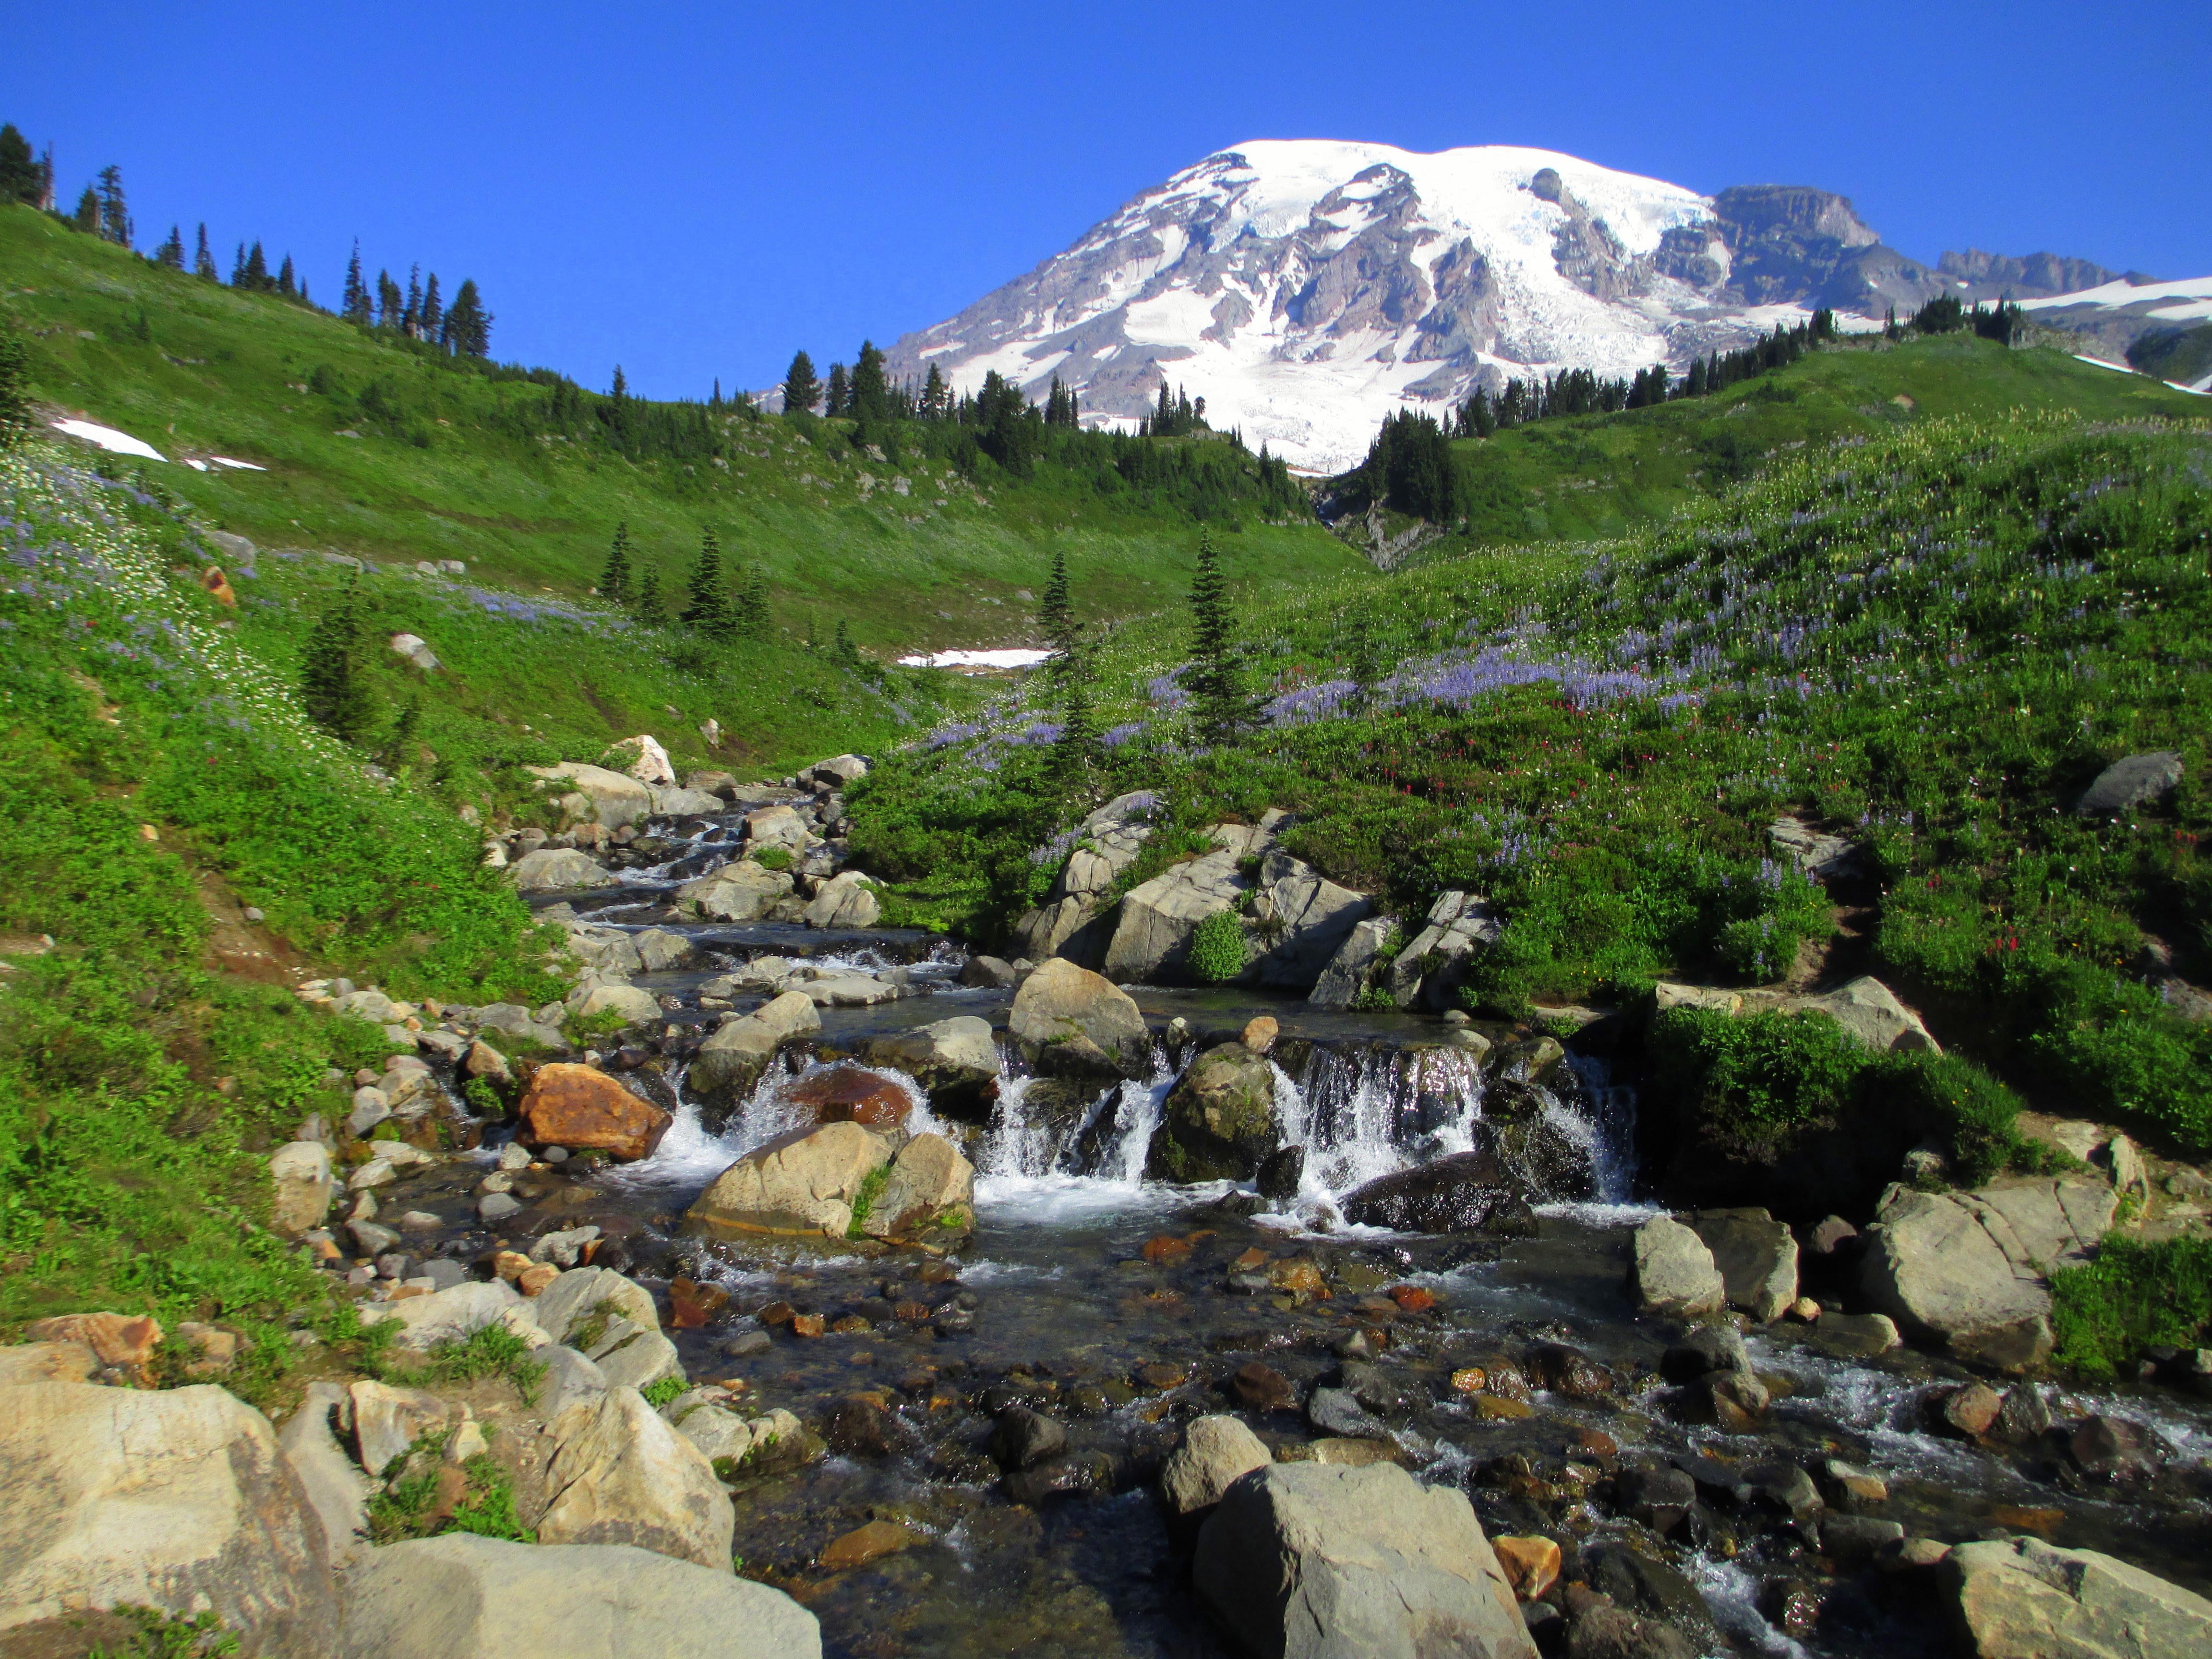 Mount Rainier National Park - Wikipedia